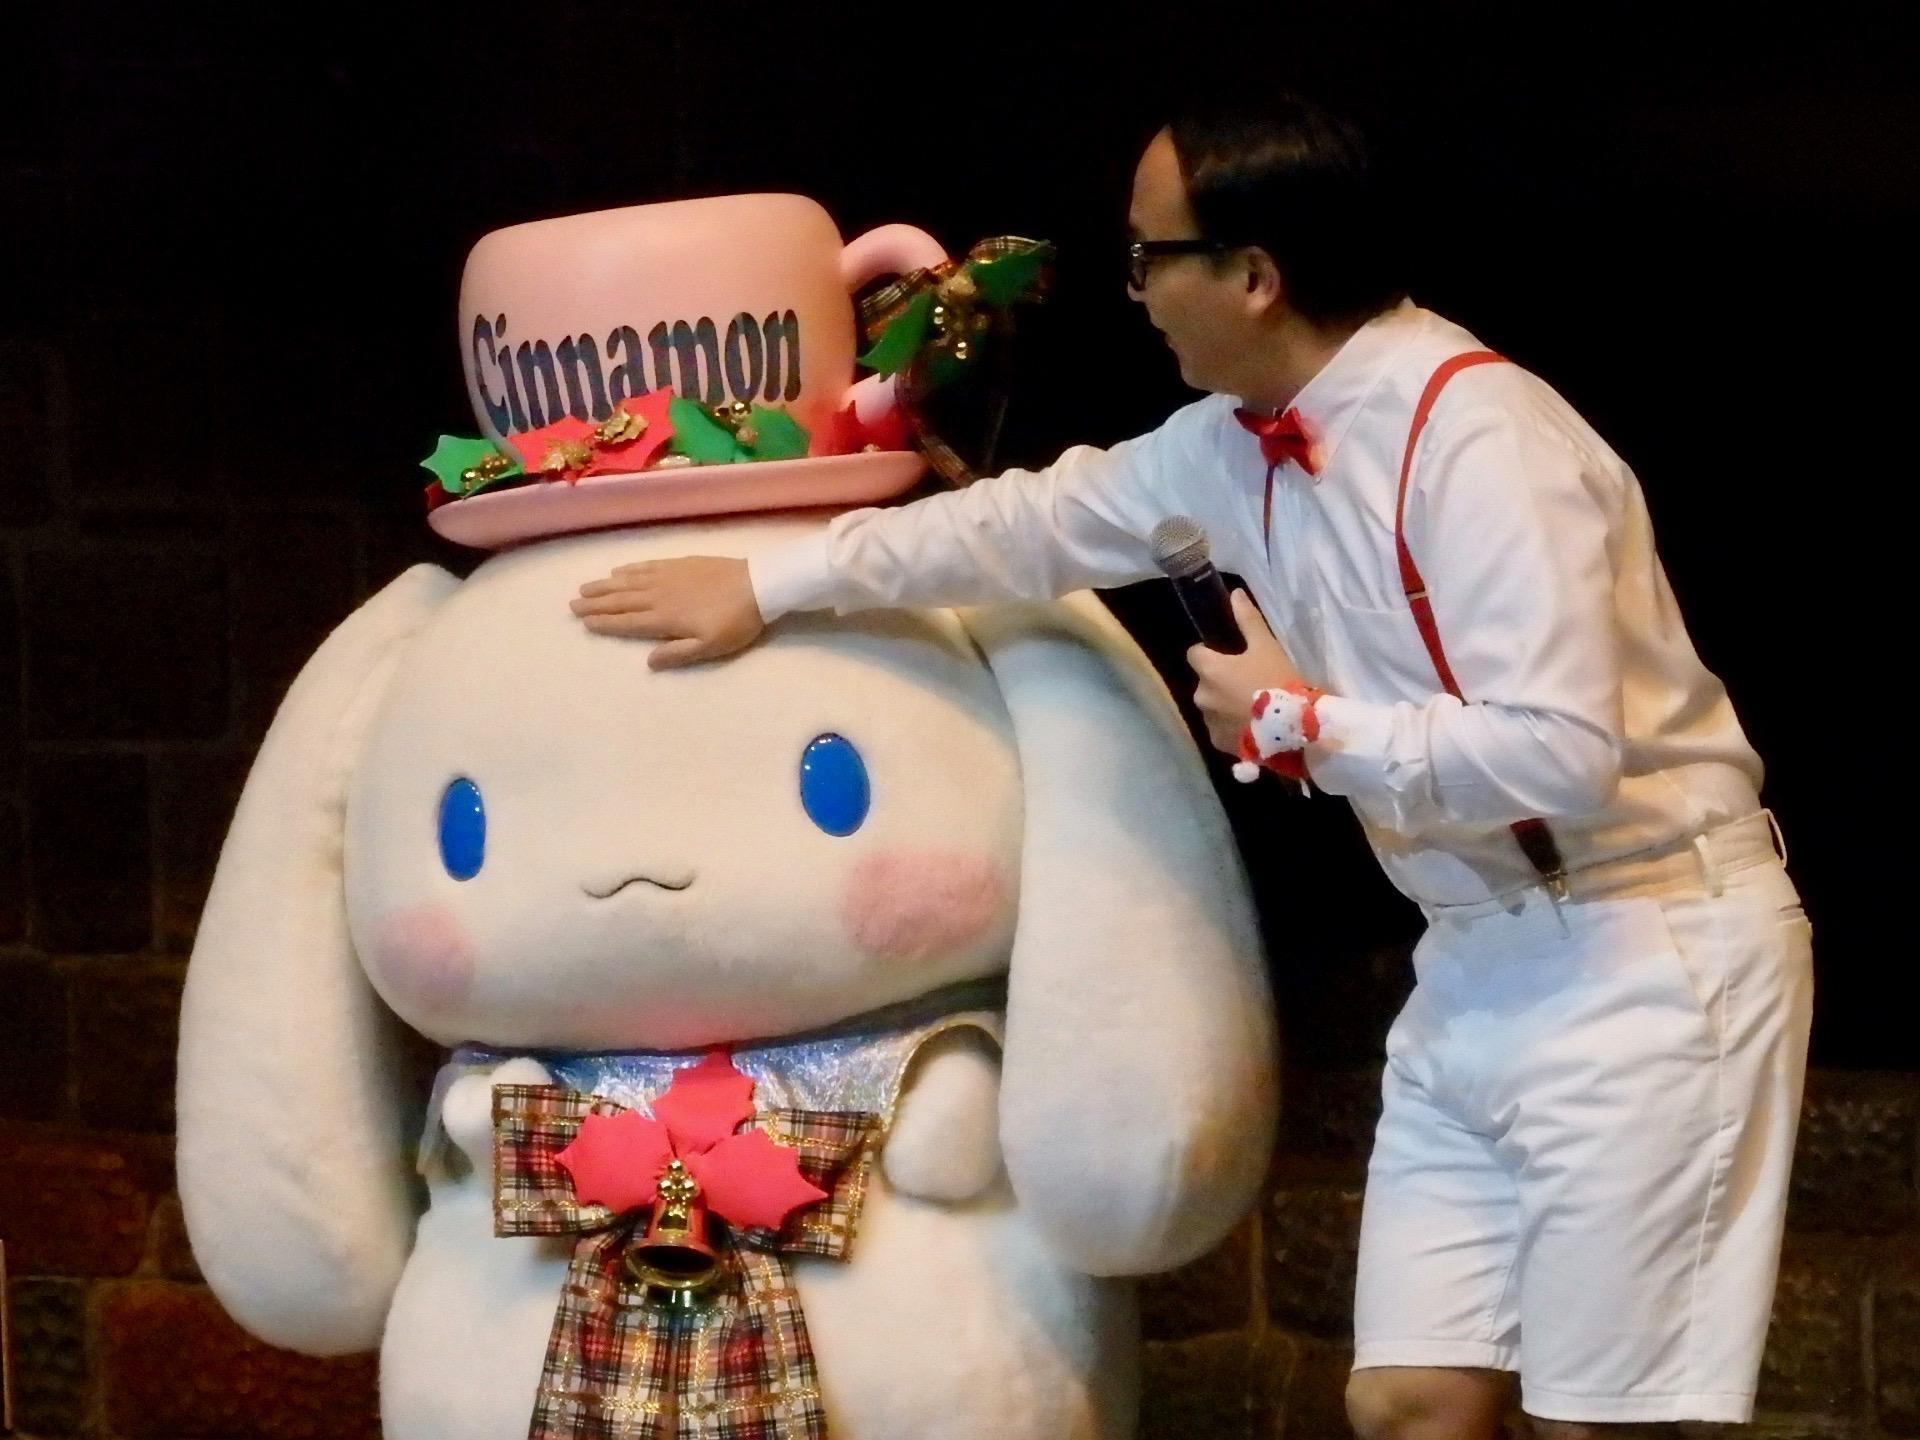 http://news.yoshimoto.co.jp/20171110003101-8f4d5fab104361f29128e03370fece9c3df29757.jpg